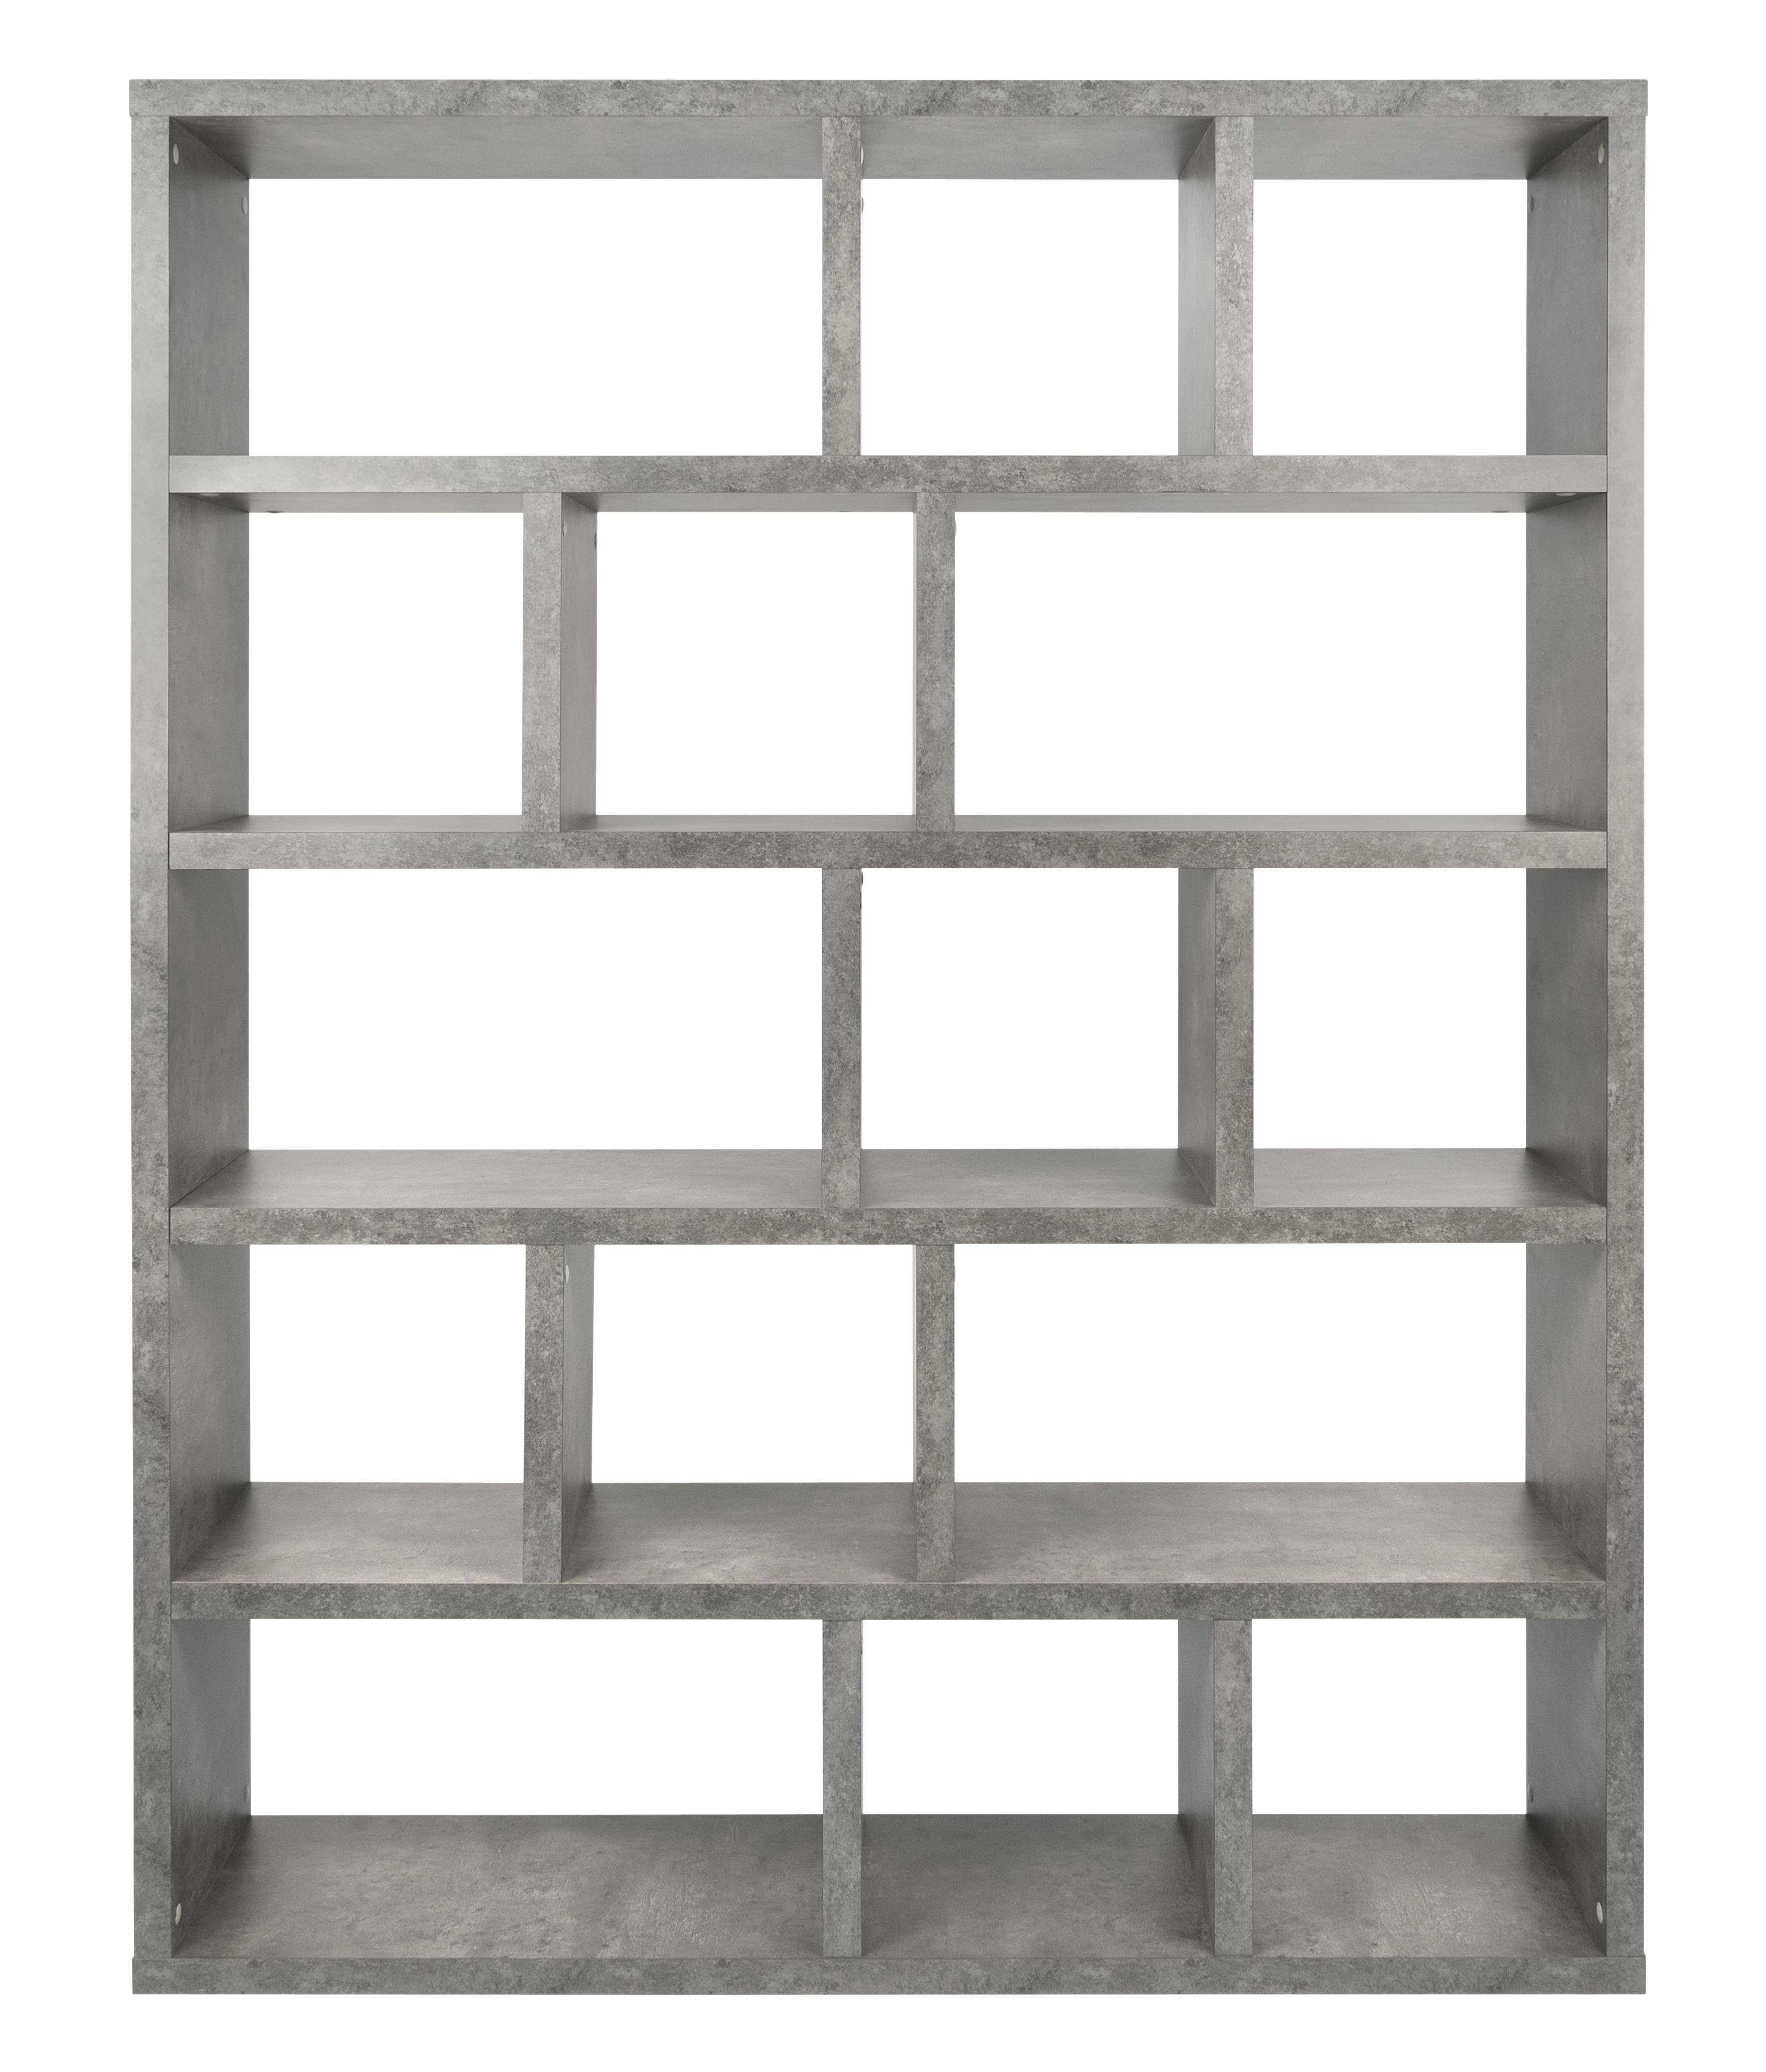 Furniture - Bookcases & Bookshelves - Rotterdam Bookcase - / L 150 x H 198 cm - Concrete effect by POP UP HOME - Concrete effect - Melamine honeycomb panels